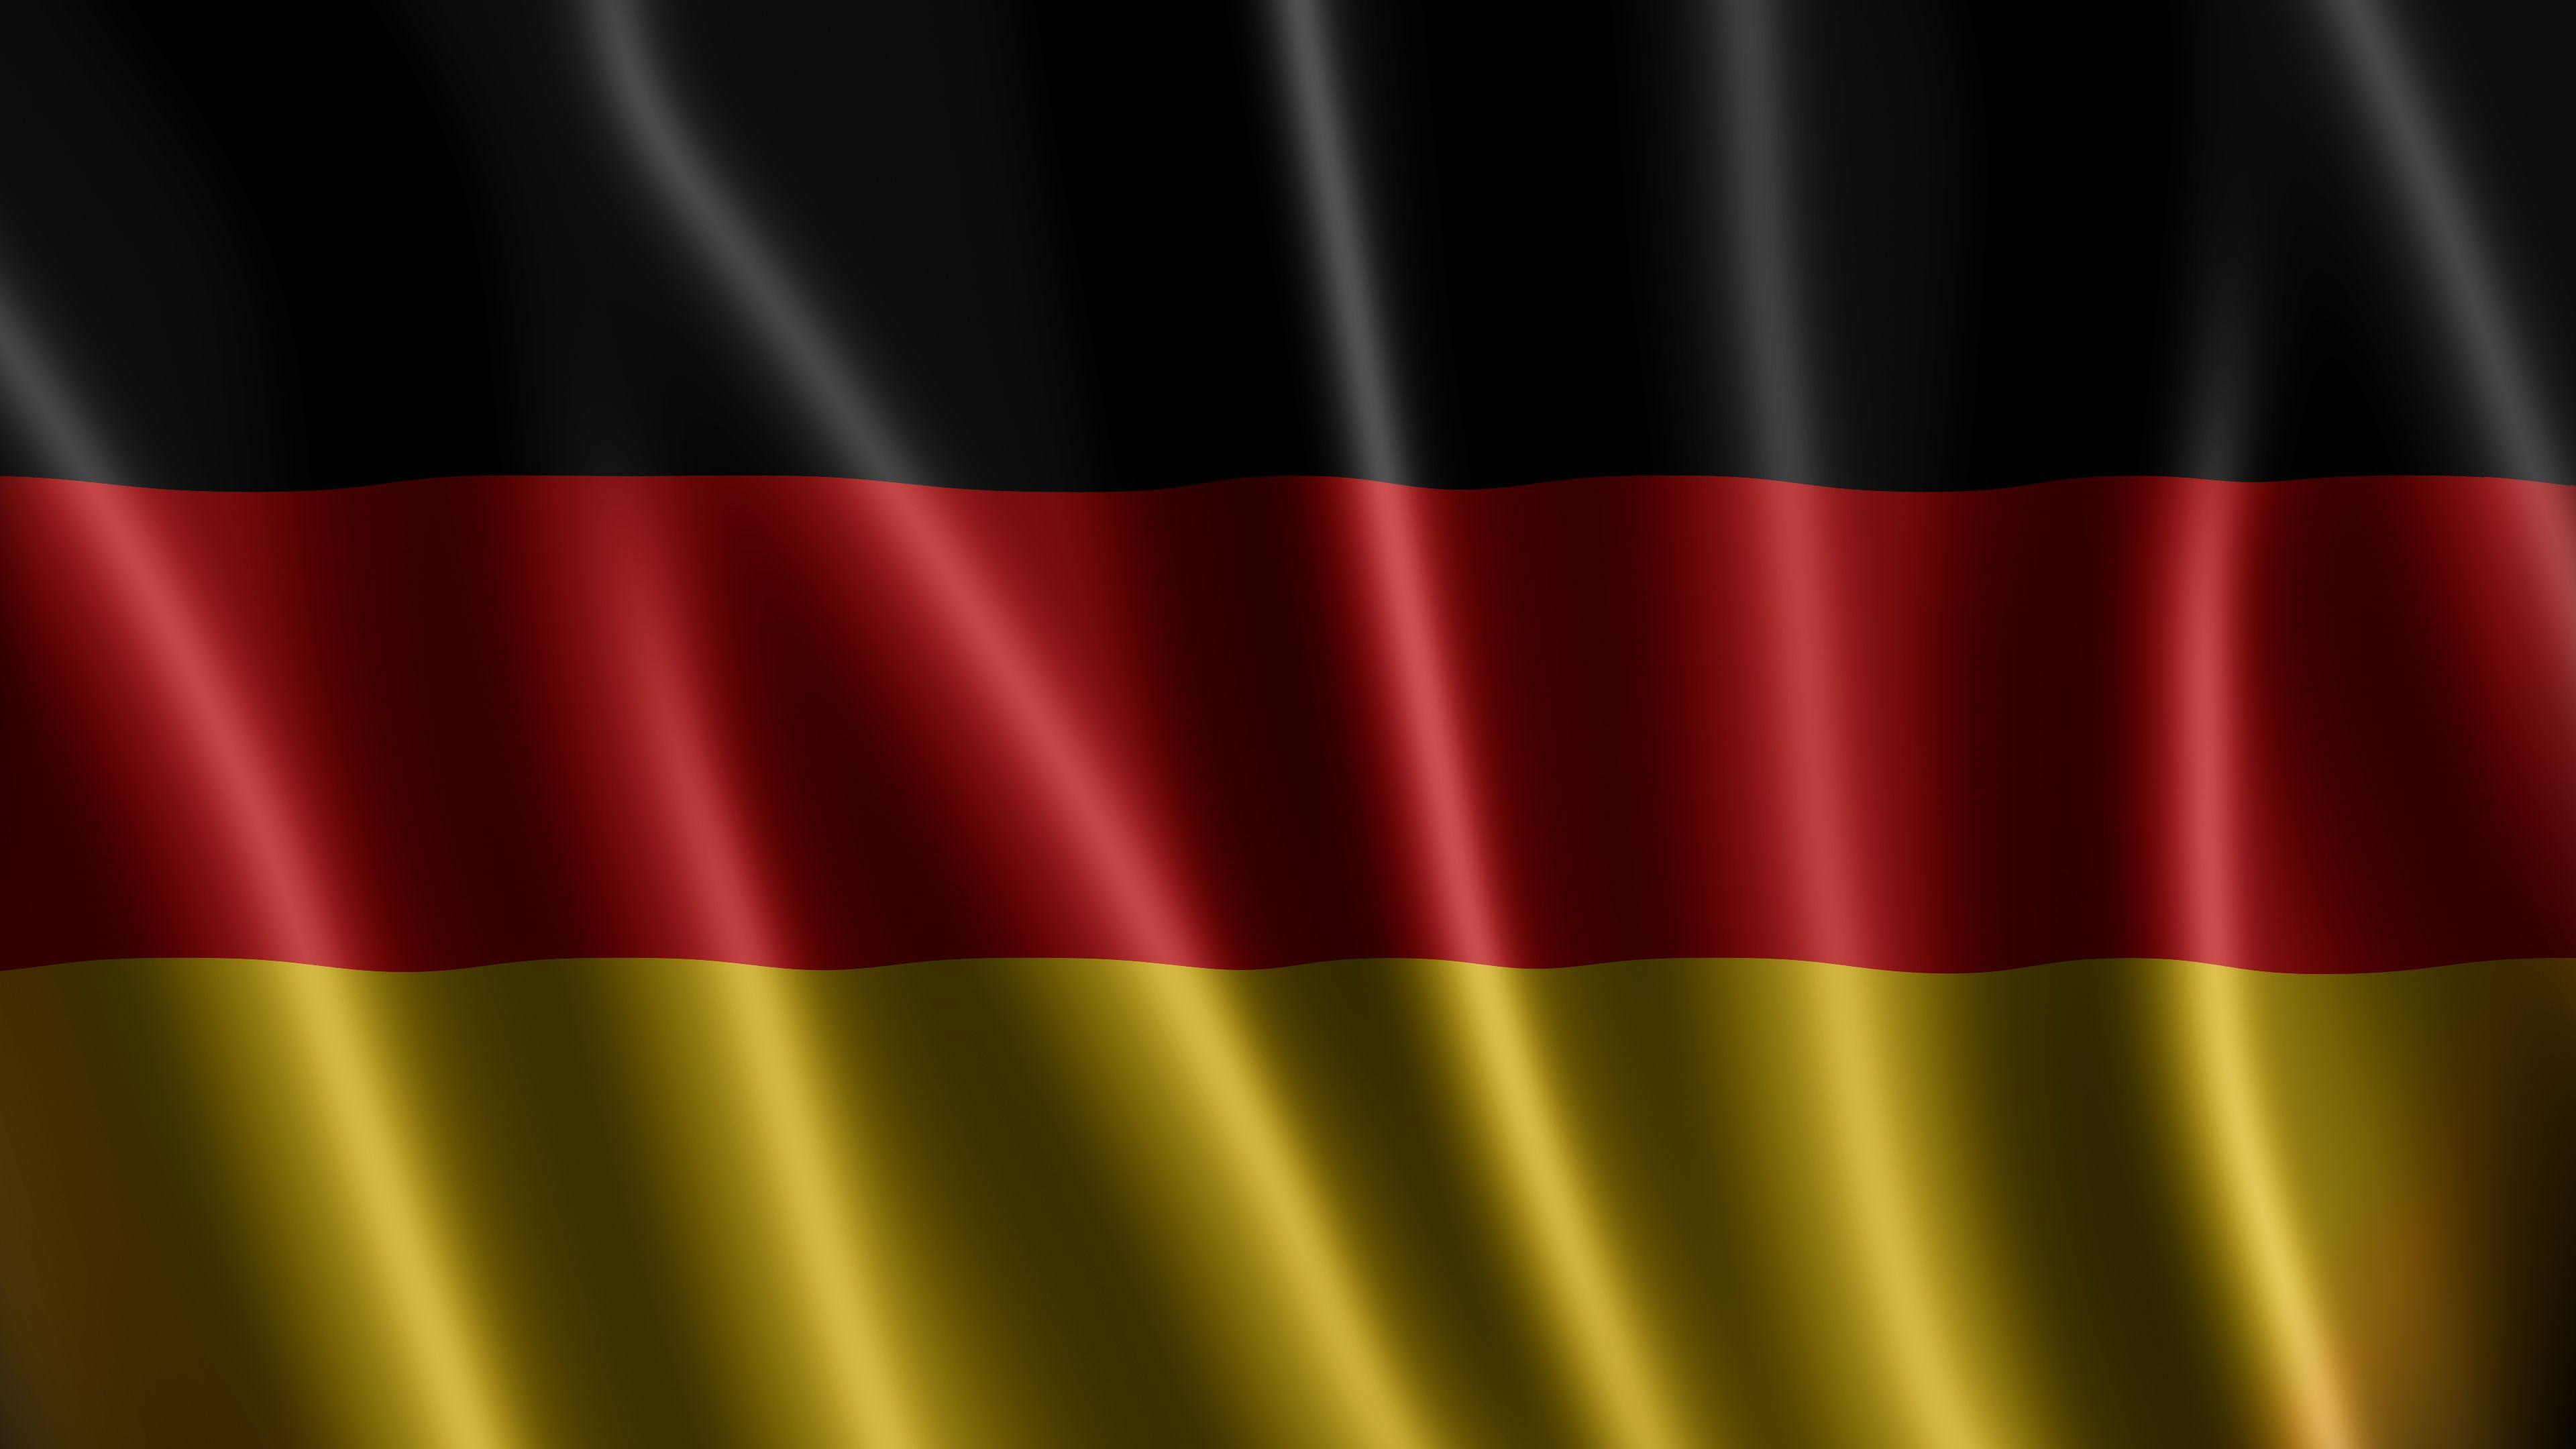 German Flag Wallpaper For Desktop